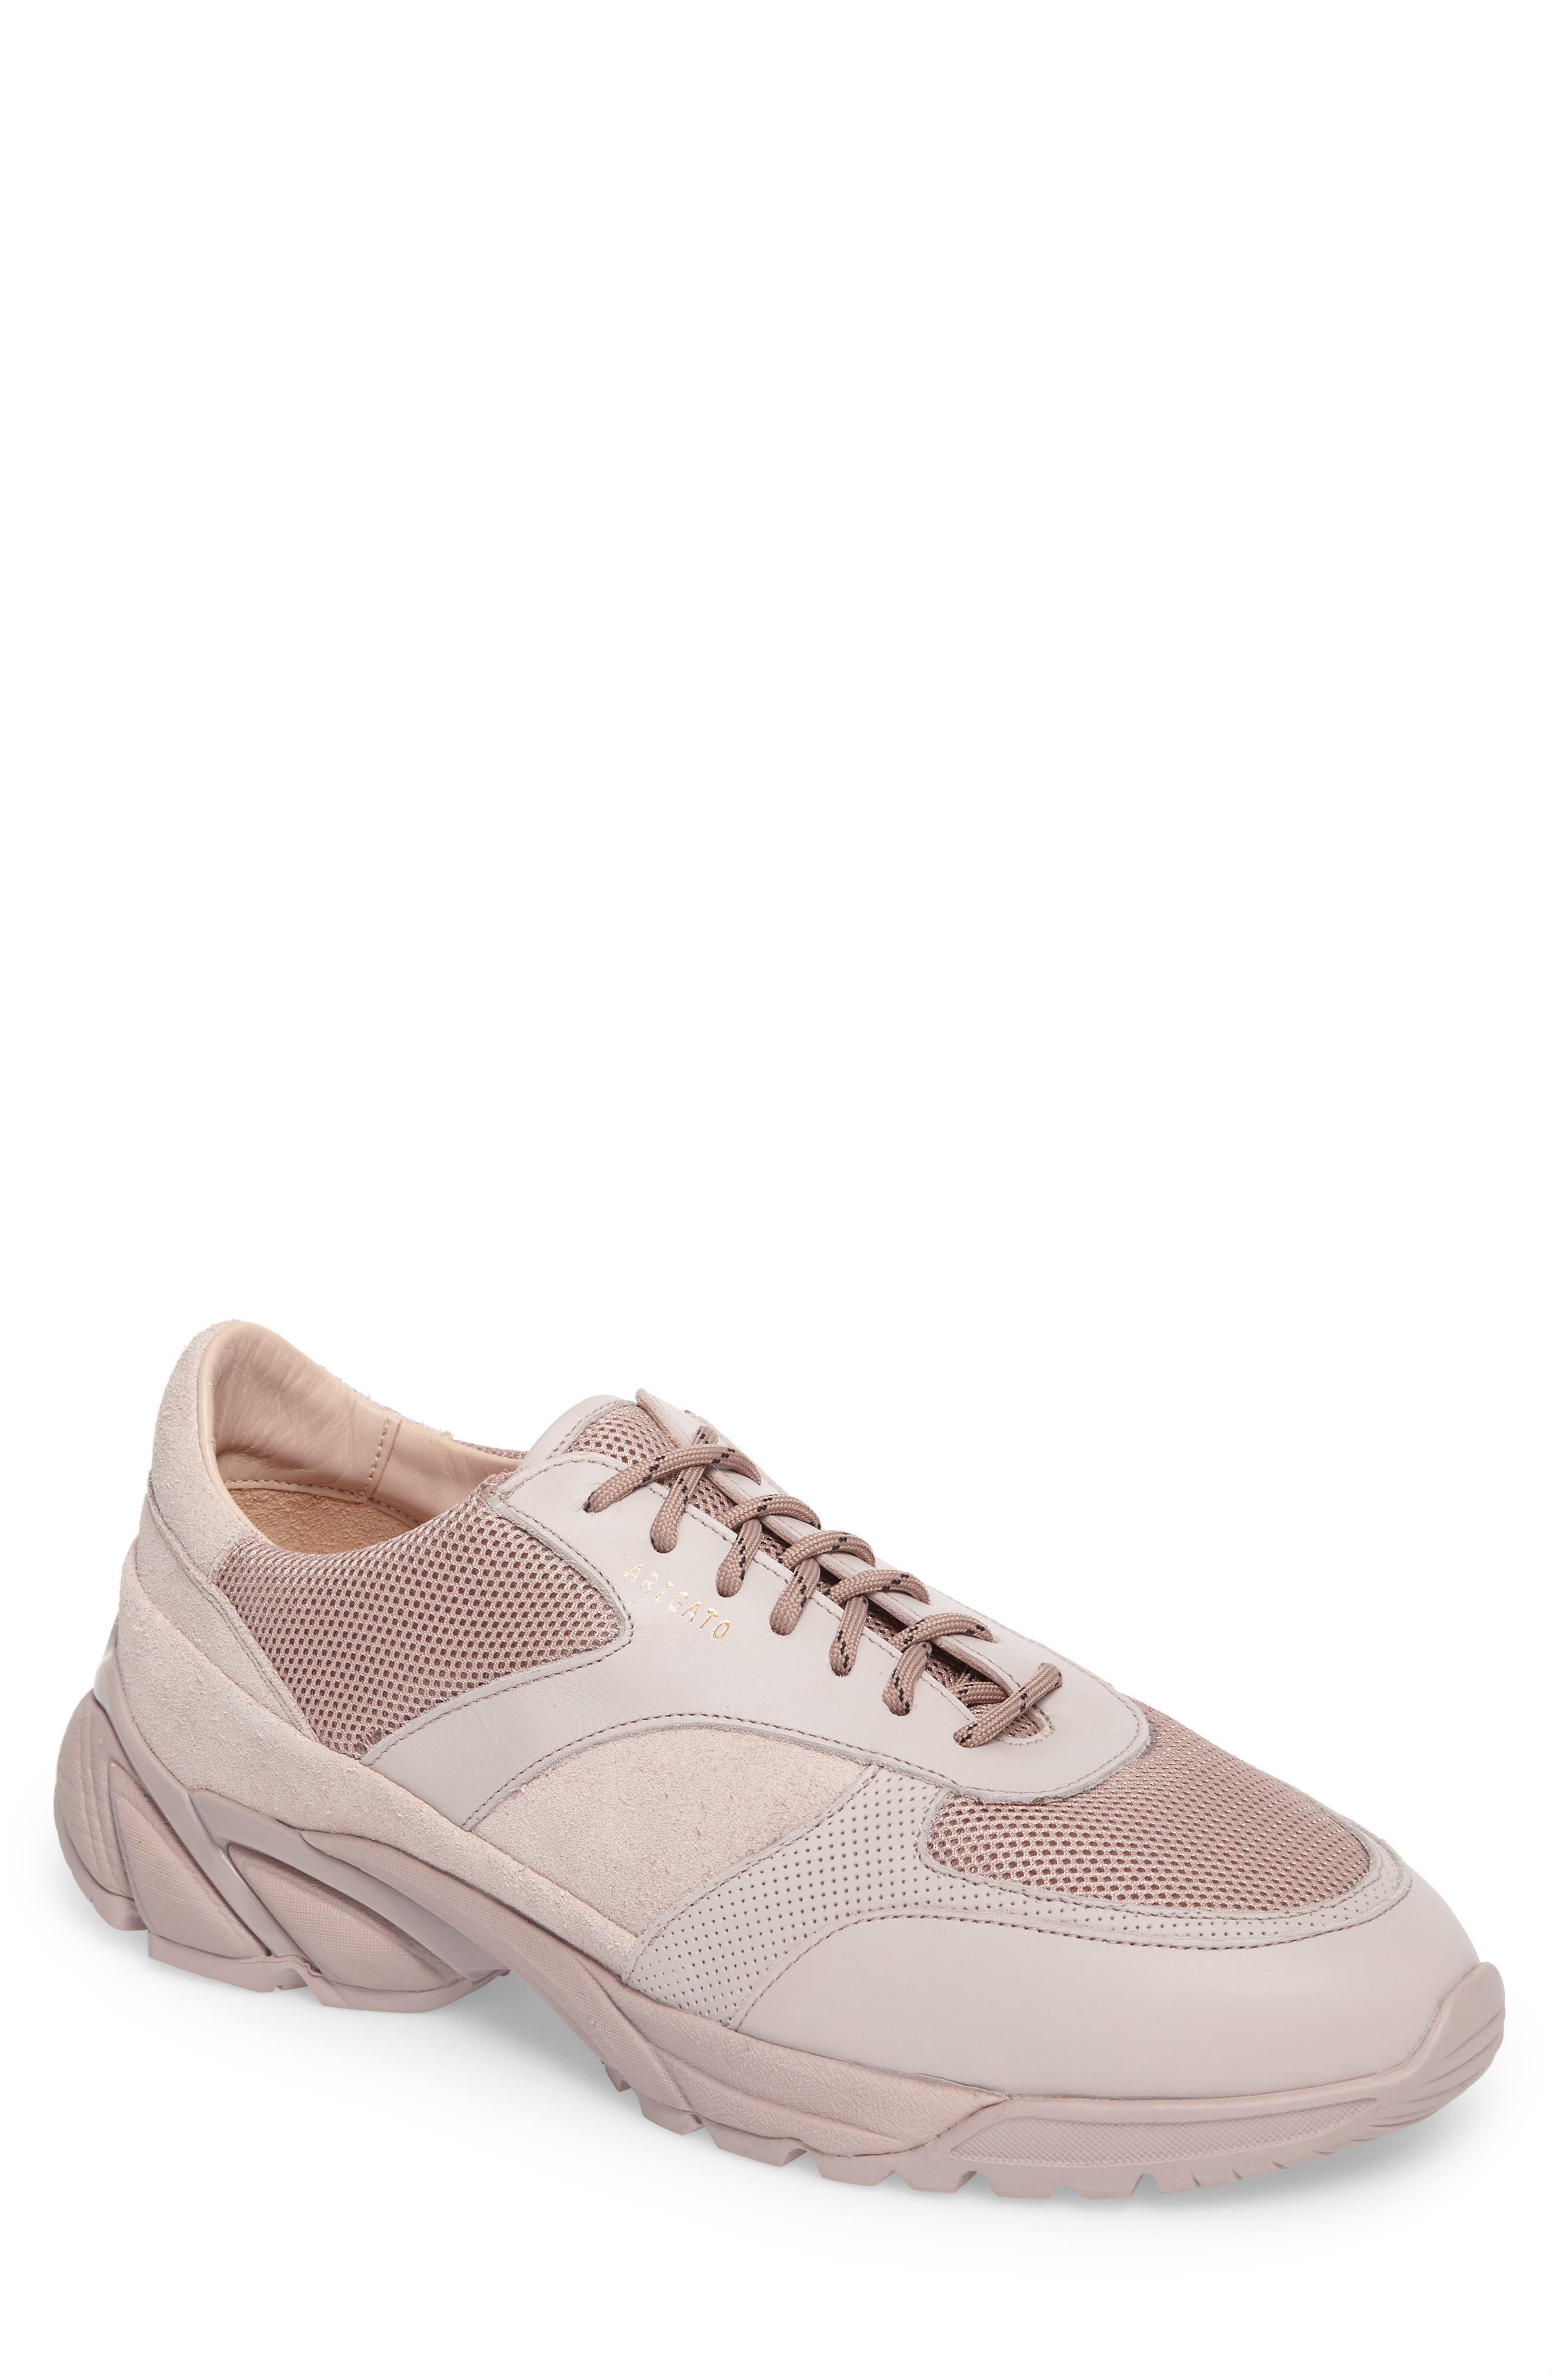 Tech Sneaker,                             Main thumbnail 1, color,                             650